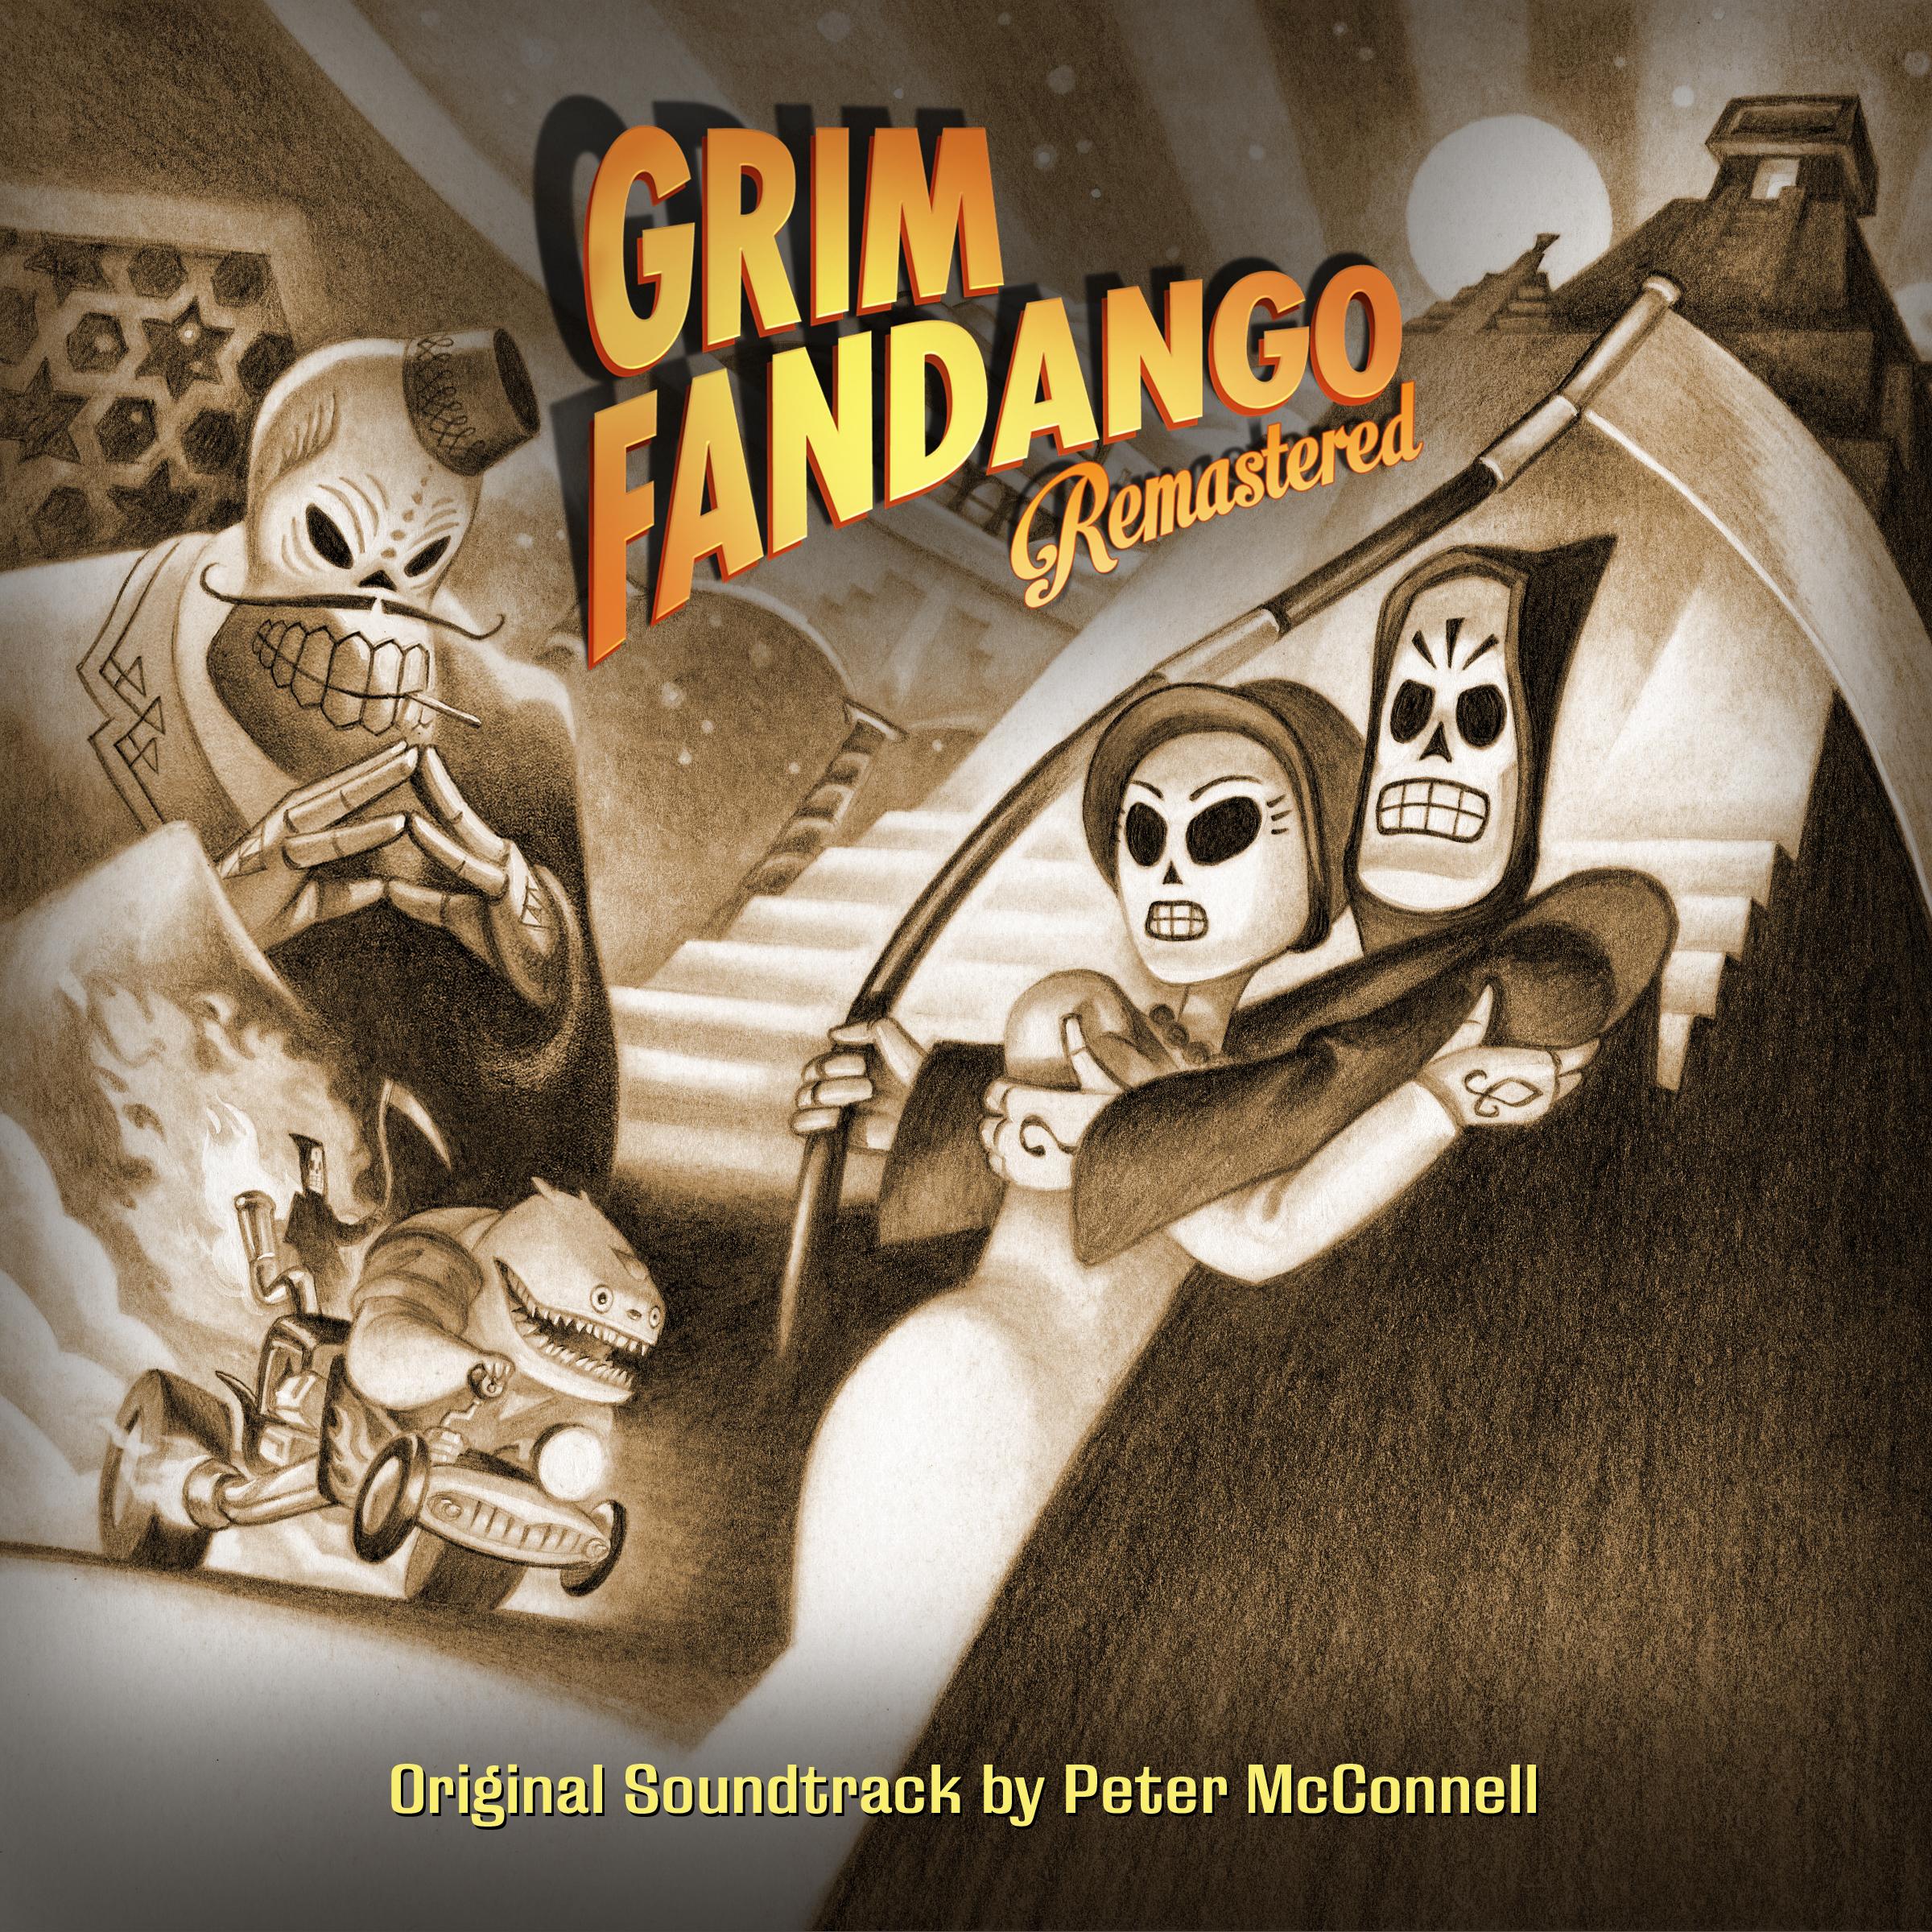 Grim Fandango Remastered - Soundtrack screenshot